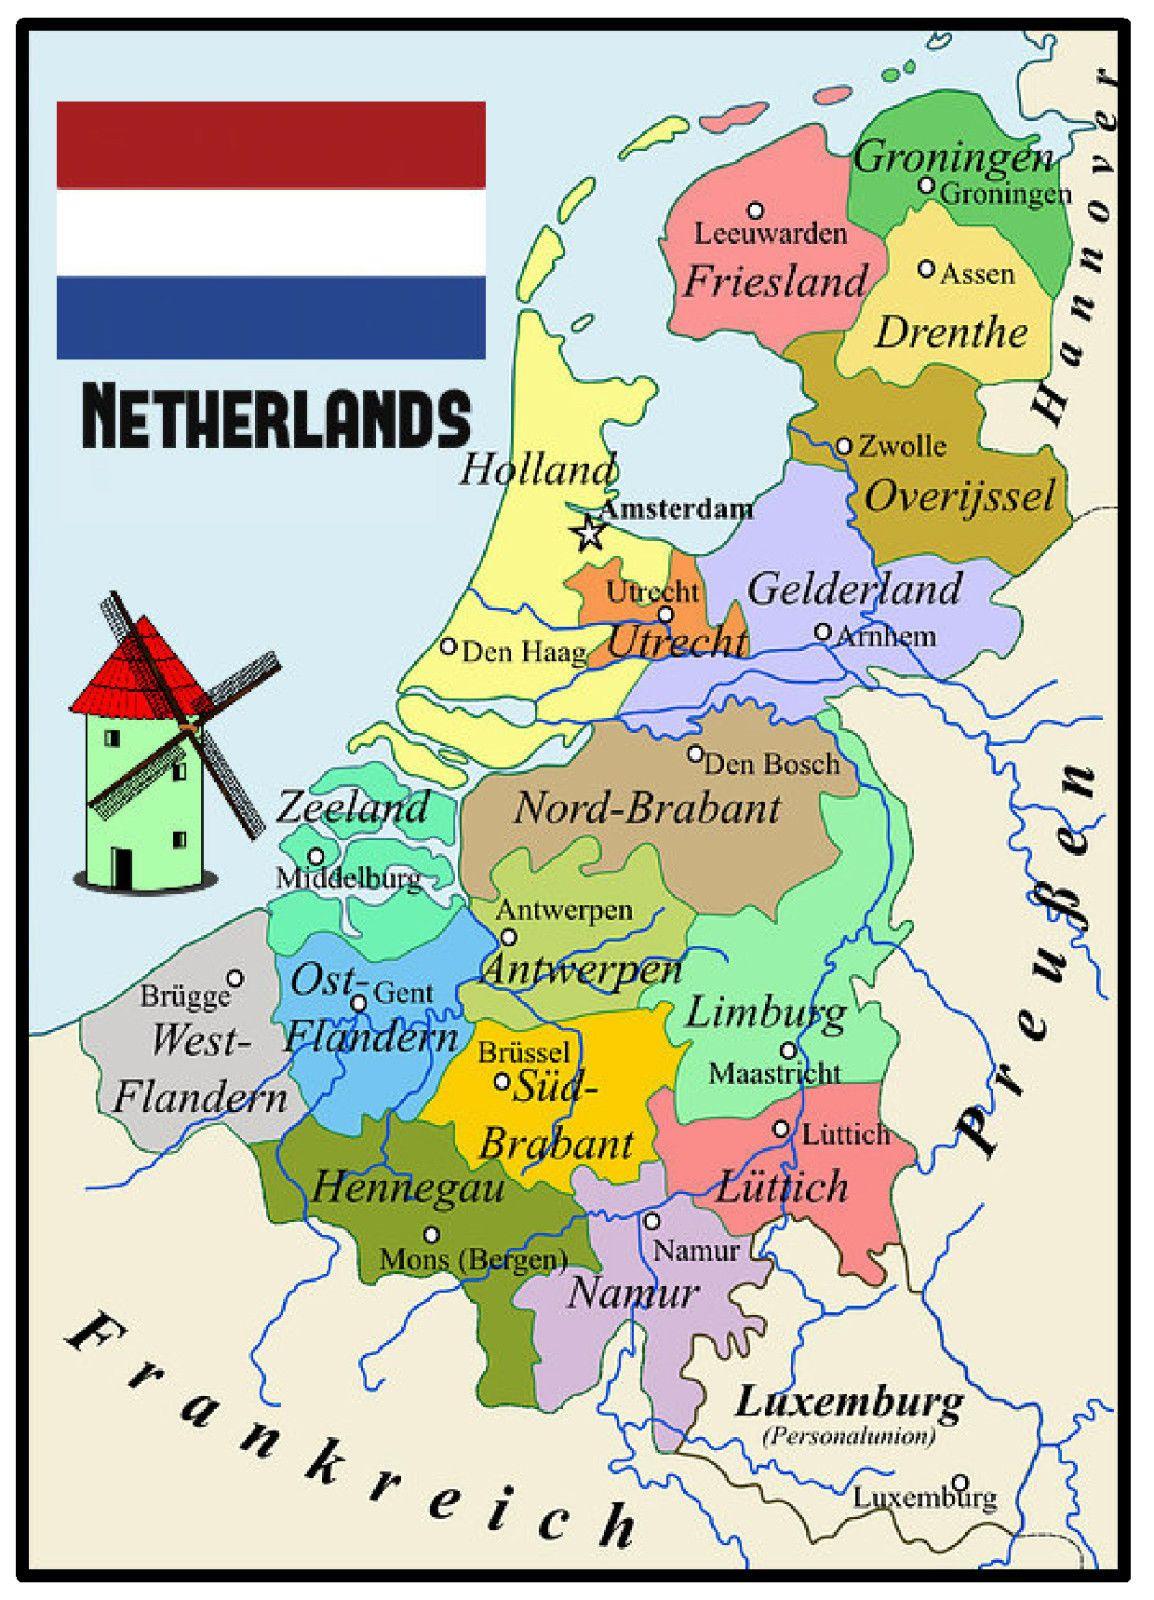 Neatherlands Map Souvenir Novelty Fridge Magnet Sights Gifts